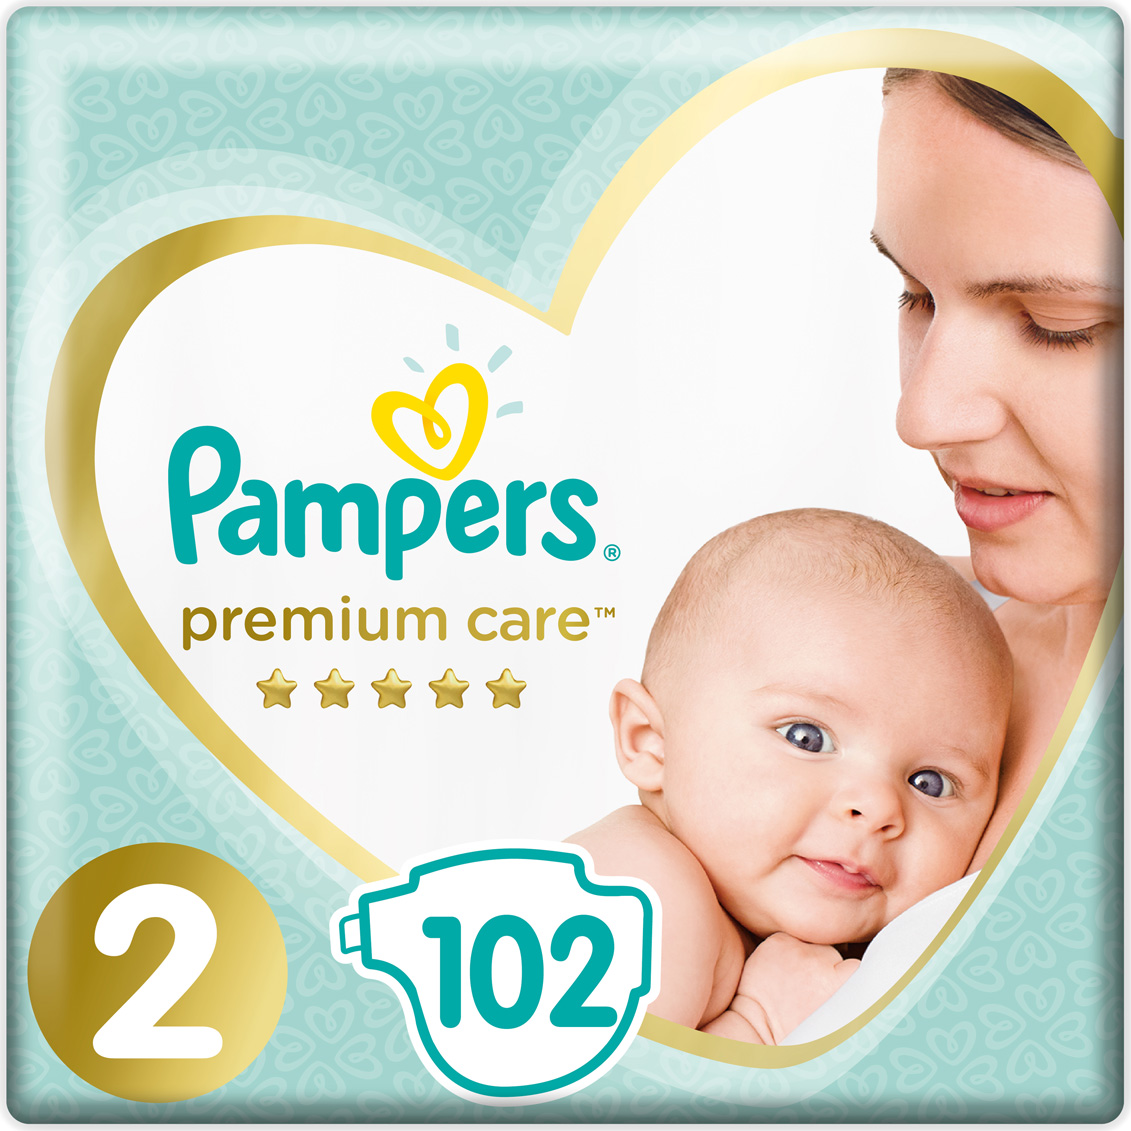 Pampers Подгузники Premium Care Mini 4-8 кг 102 шт